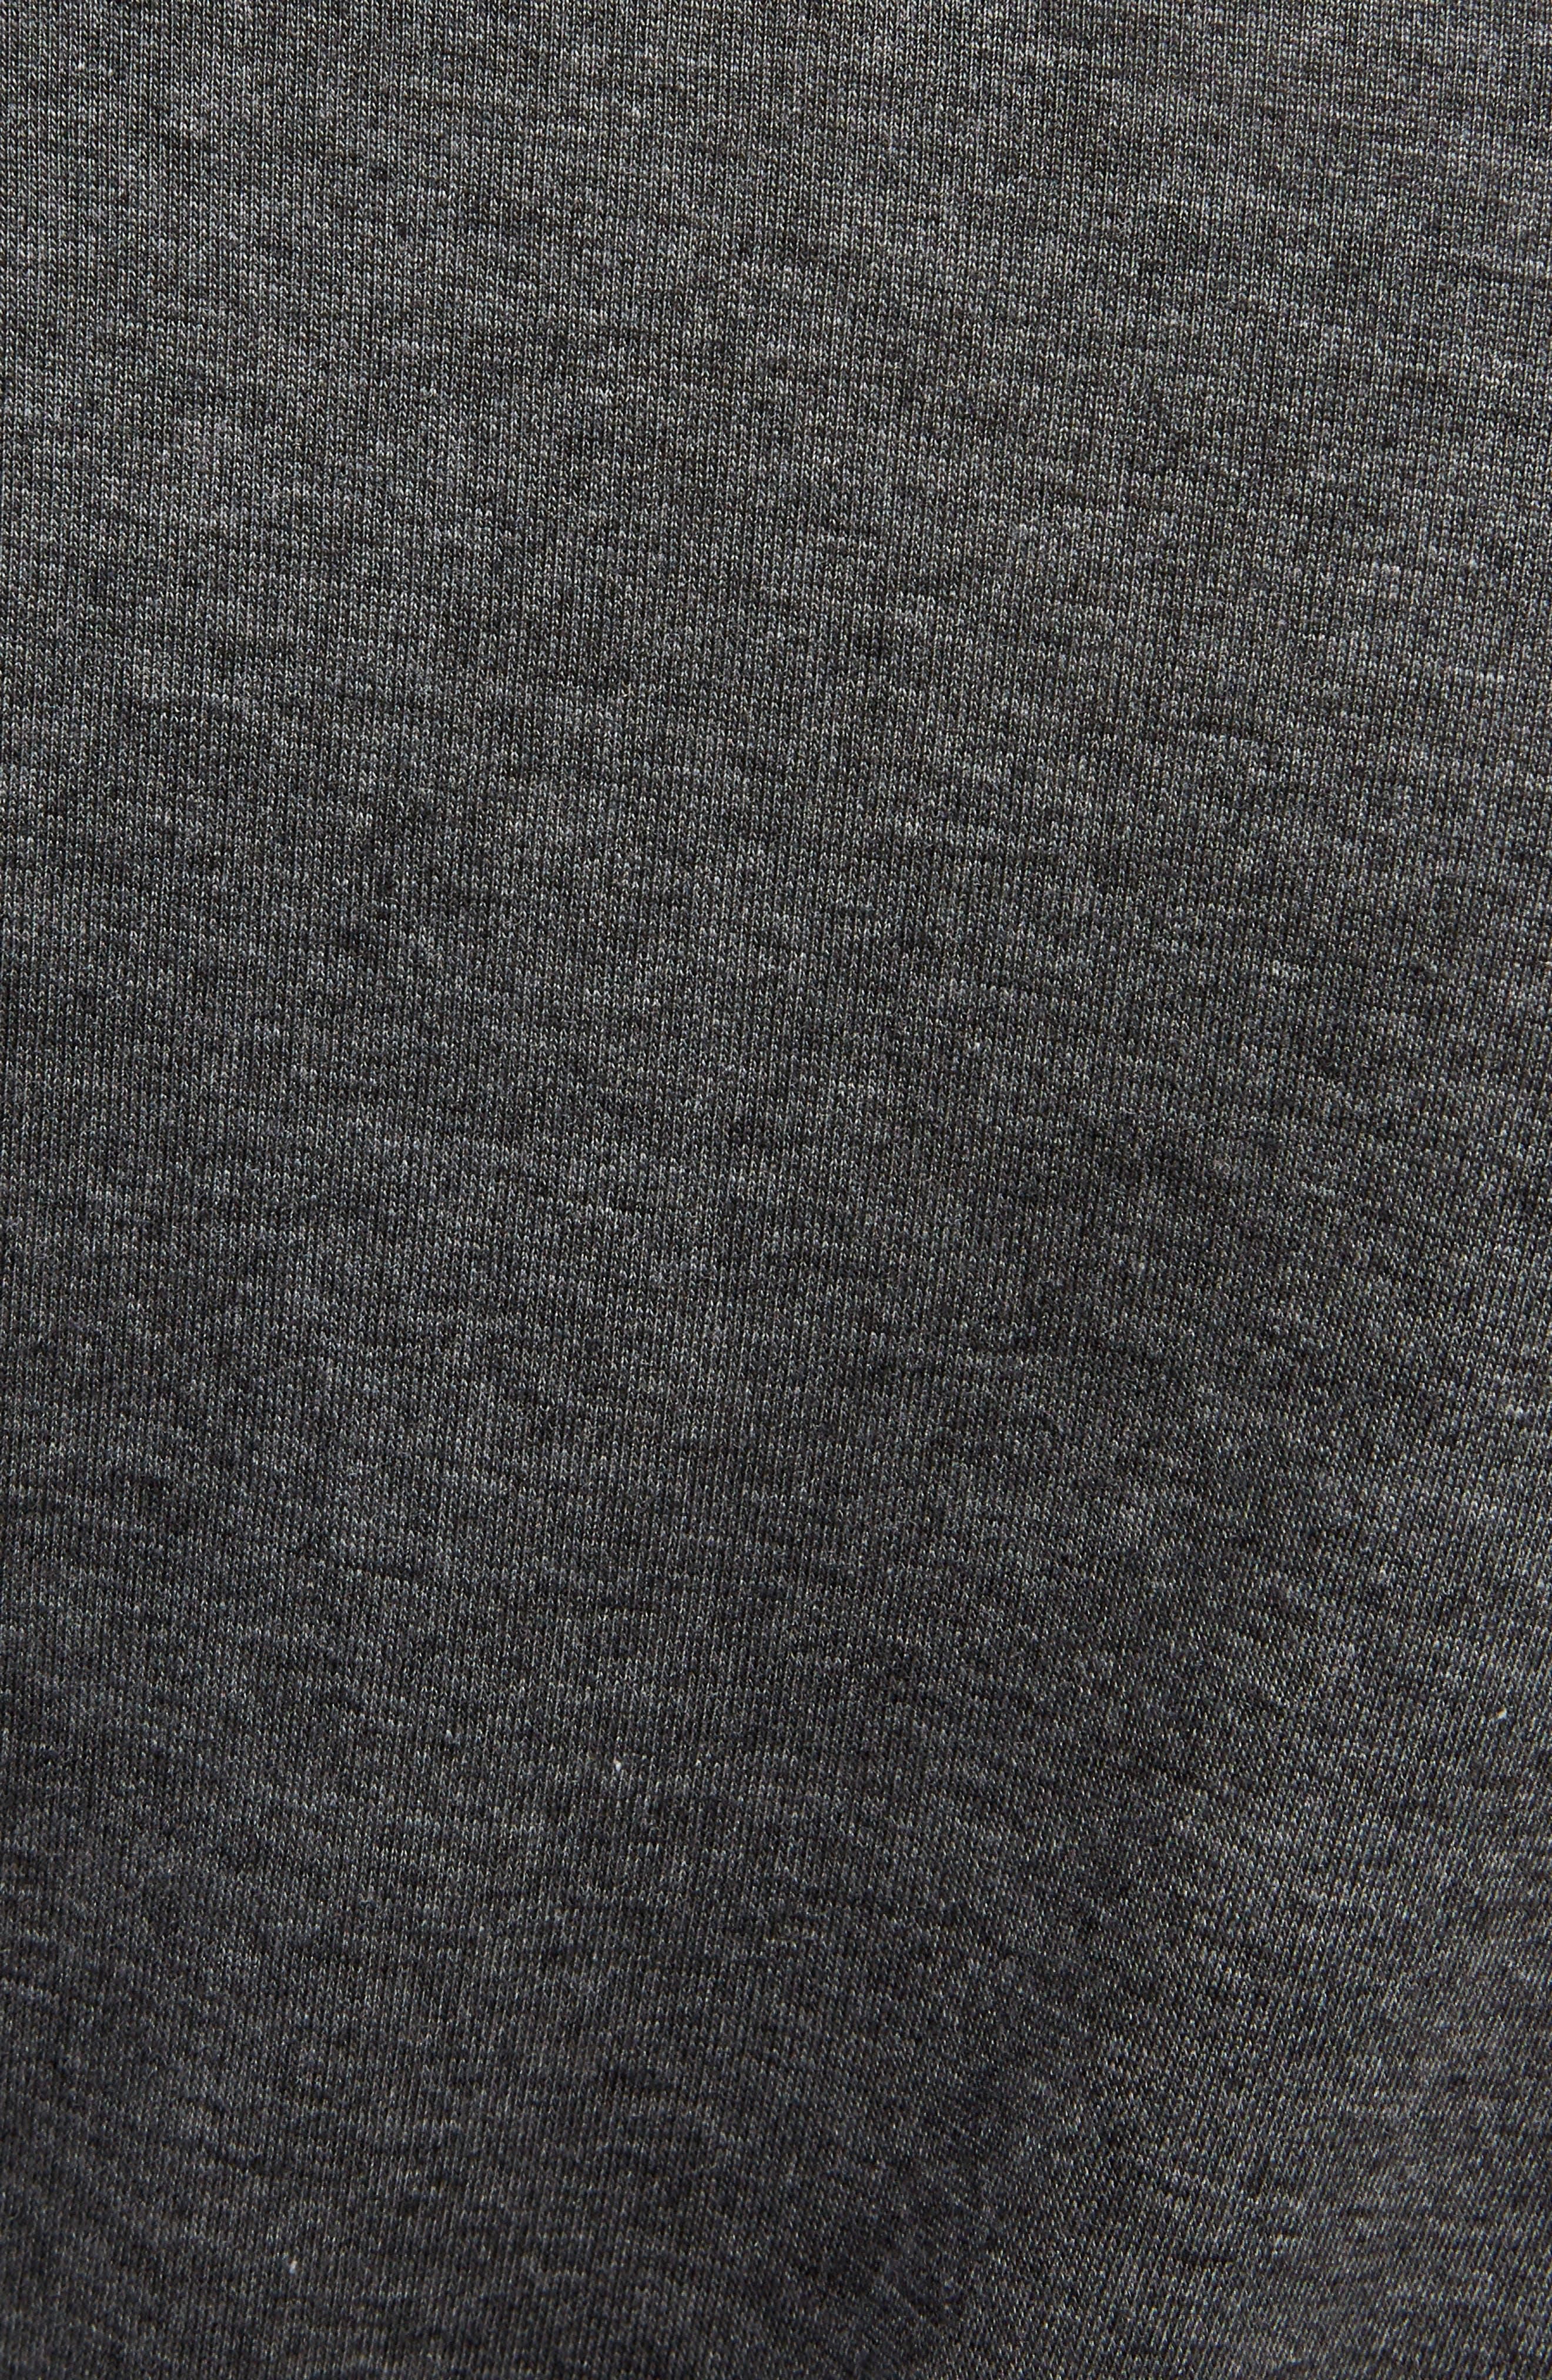 Trudela Asymmetrical Tank Dress,                             Alternate thumbnail 5, color,                             Dark Grey Melange